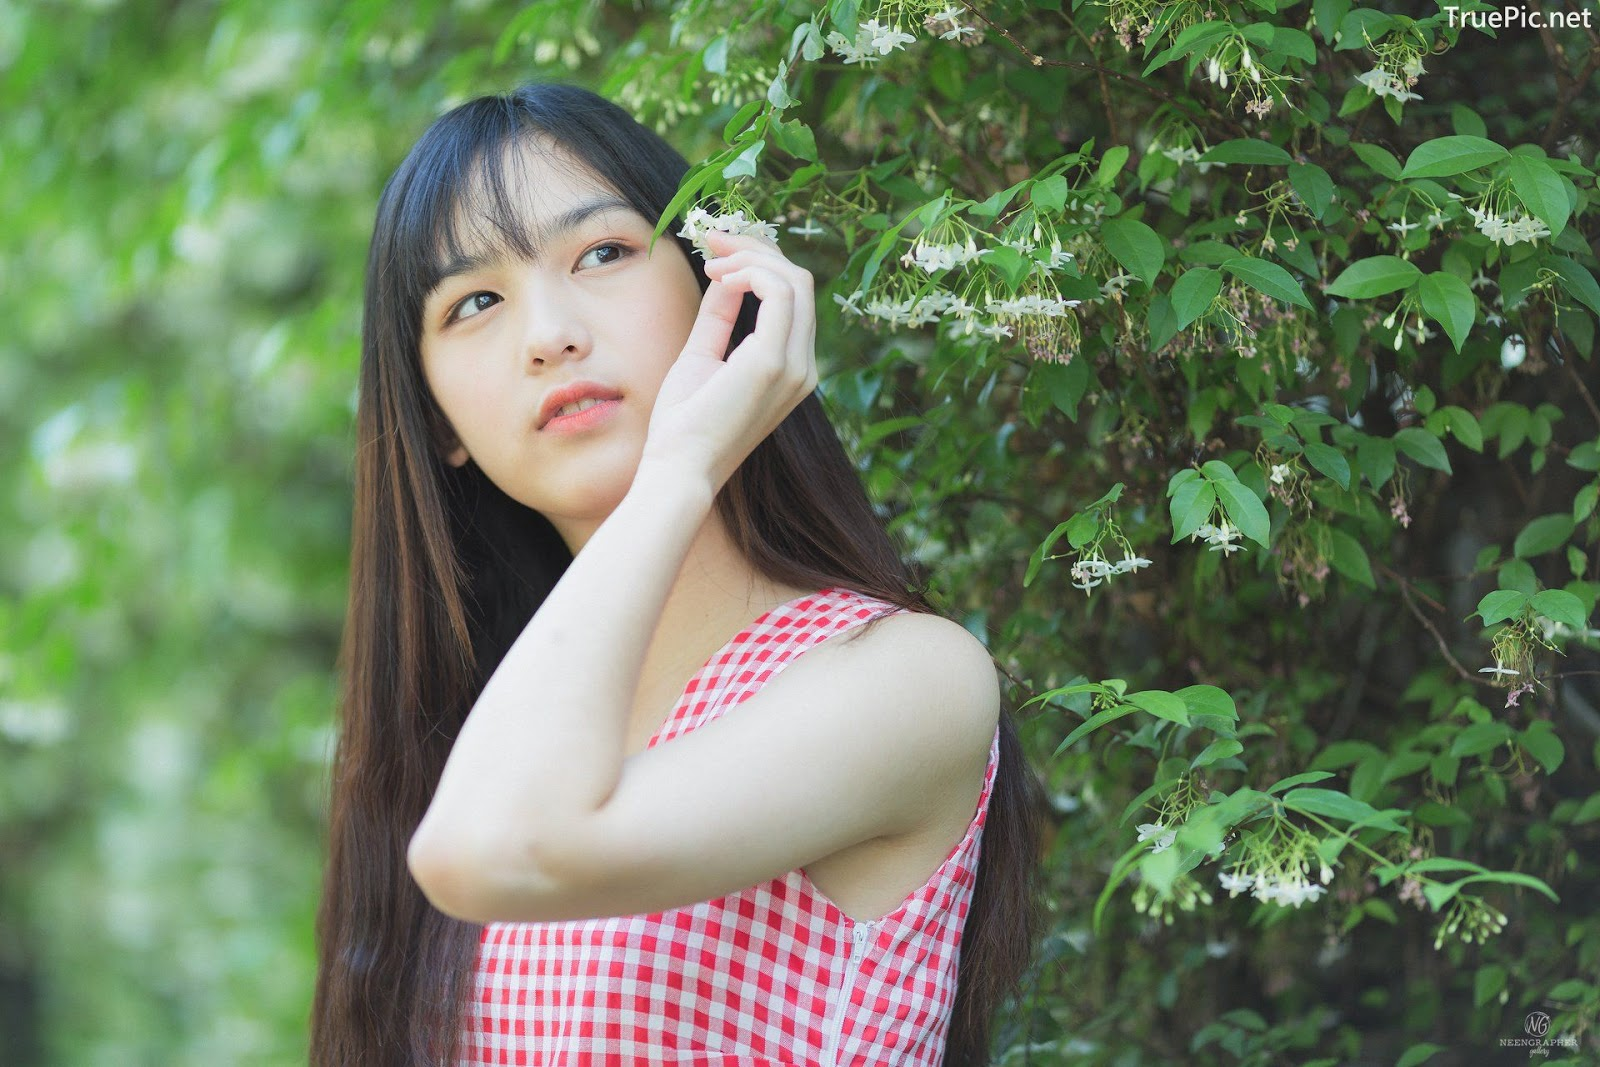 Image-Thailand-Cute-Model-Emma-Panisara–Album-Emma-Bright-Sunday-TruePic.net- Picture-25